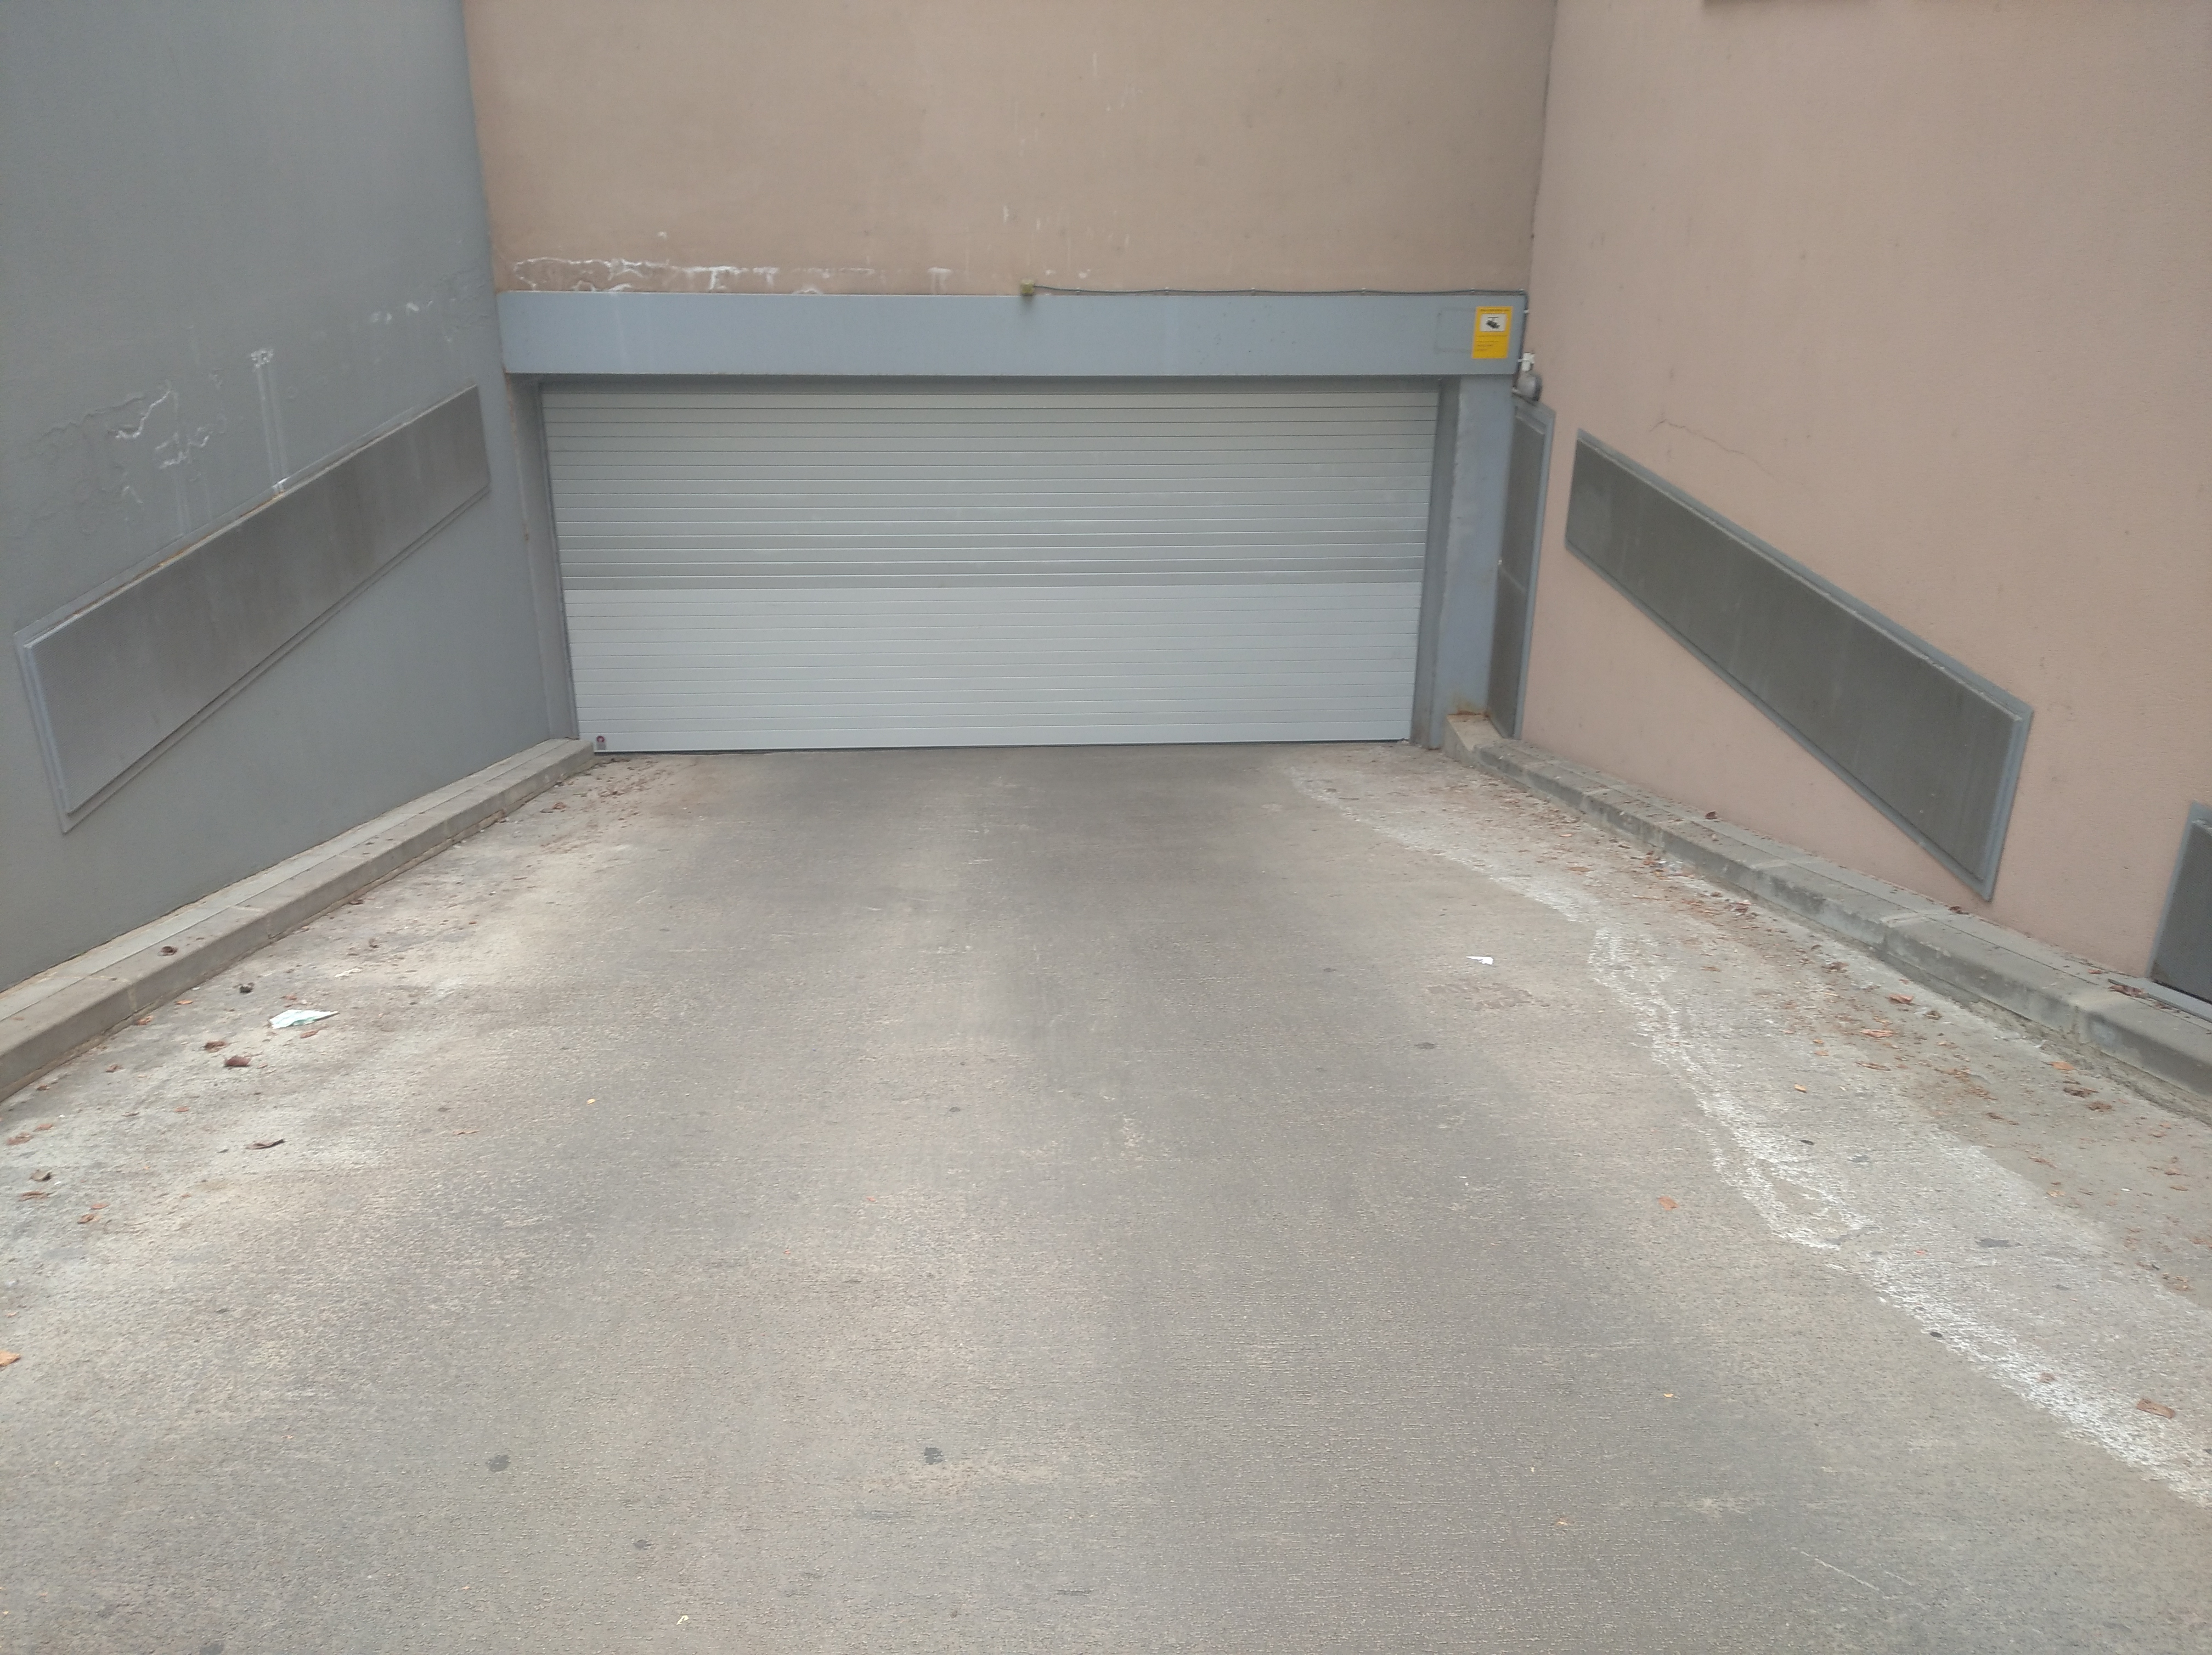 Alquiler Parking coche  Avinguda lluís pericot. Se vende plaza de aparcamiento en c/ lluis pericot 43 - zona pal